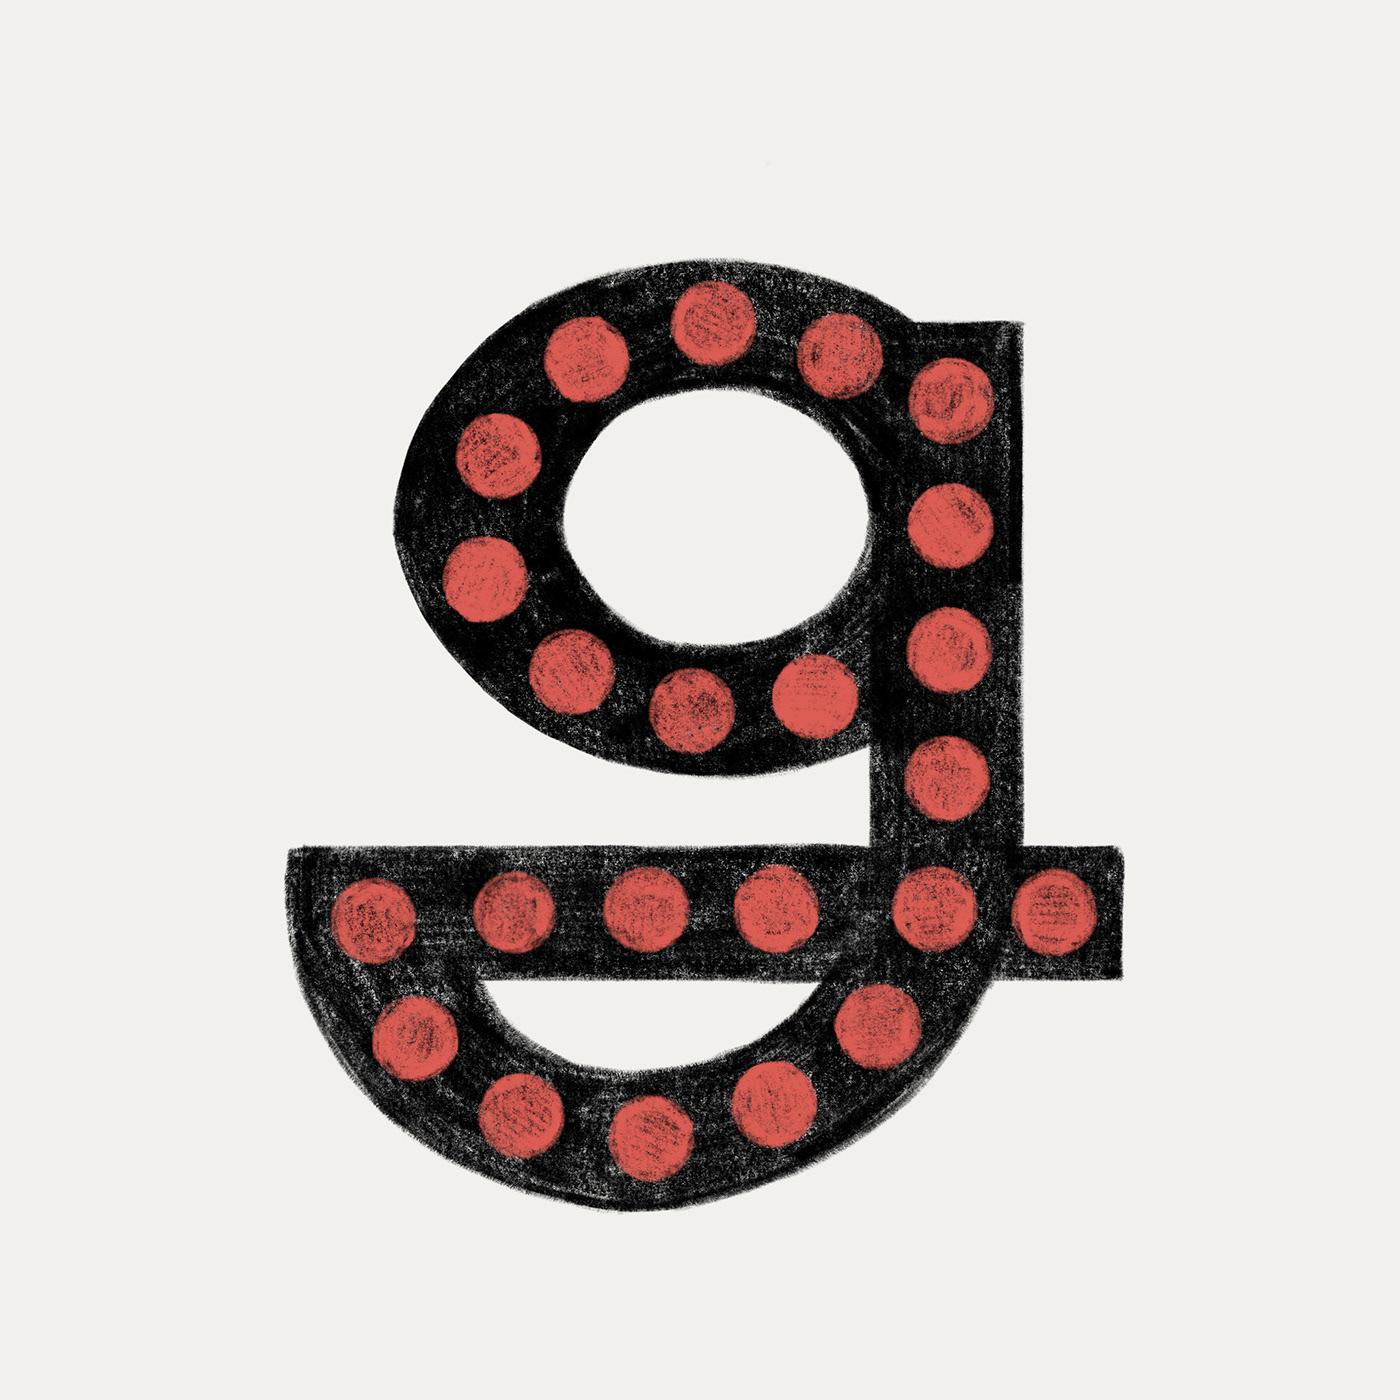 36daysoftype type alphabet numbers typeandlettering letters lettering Handlettering handmade handdrawn